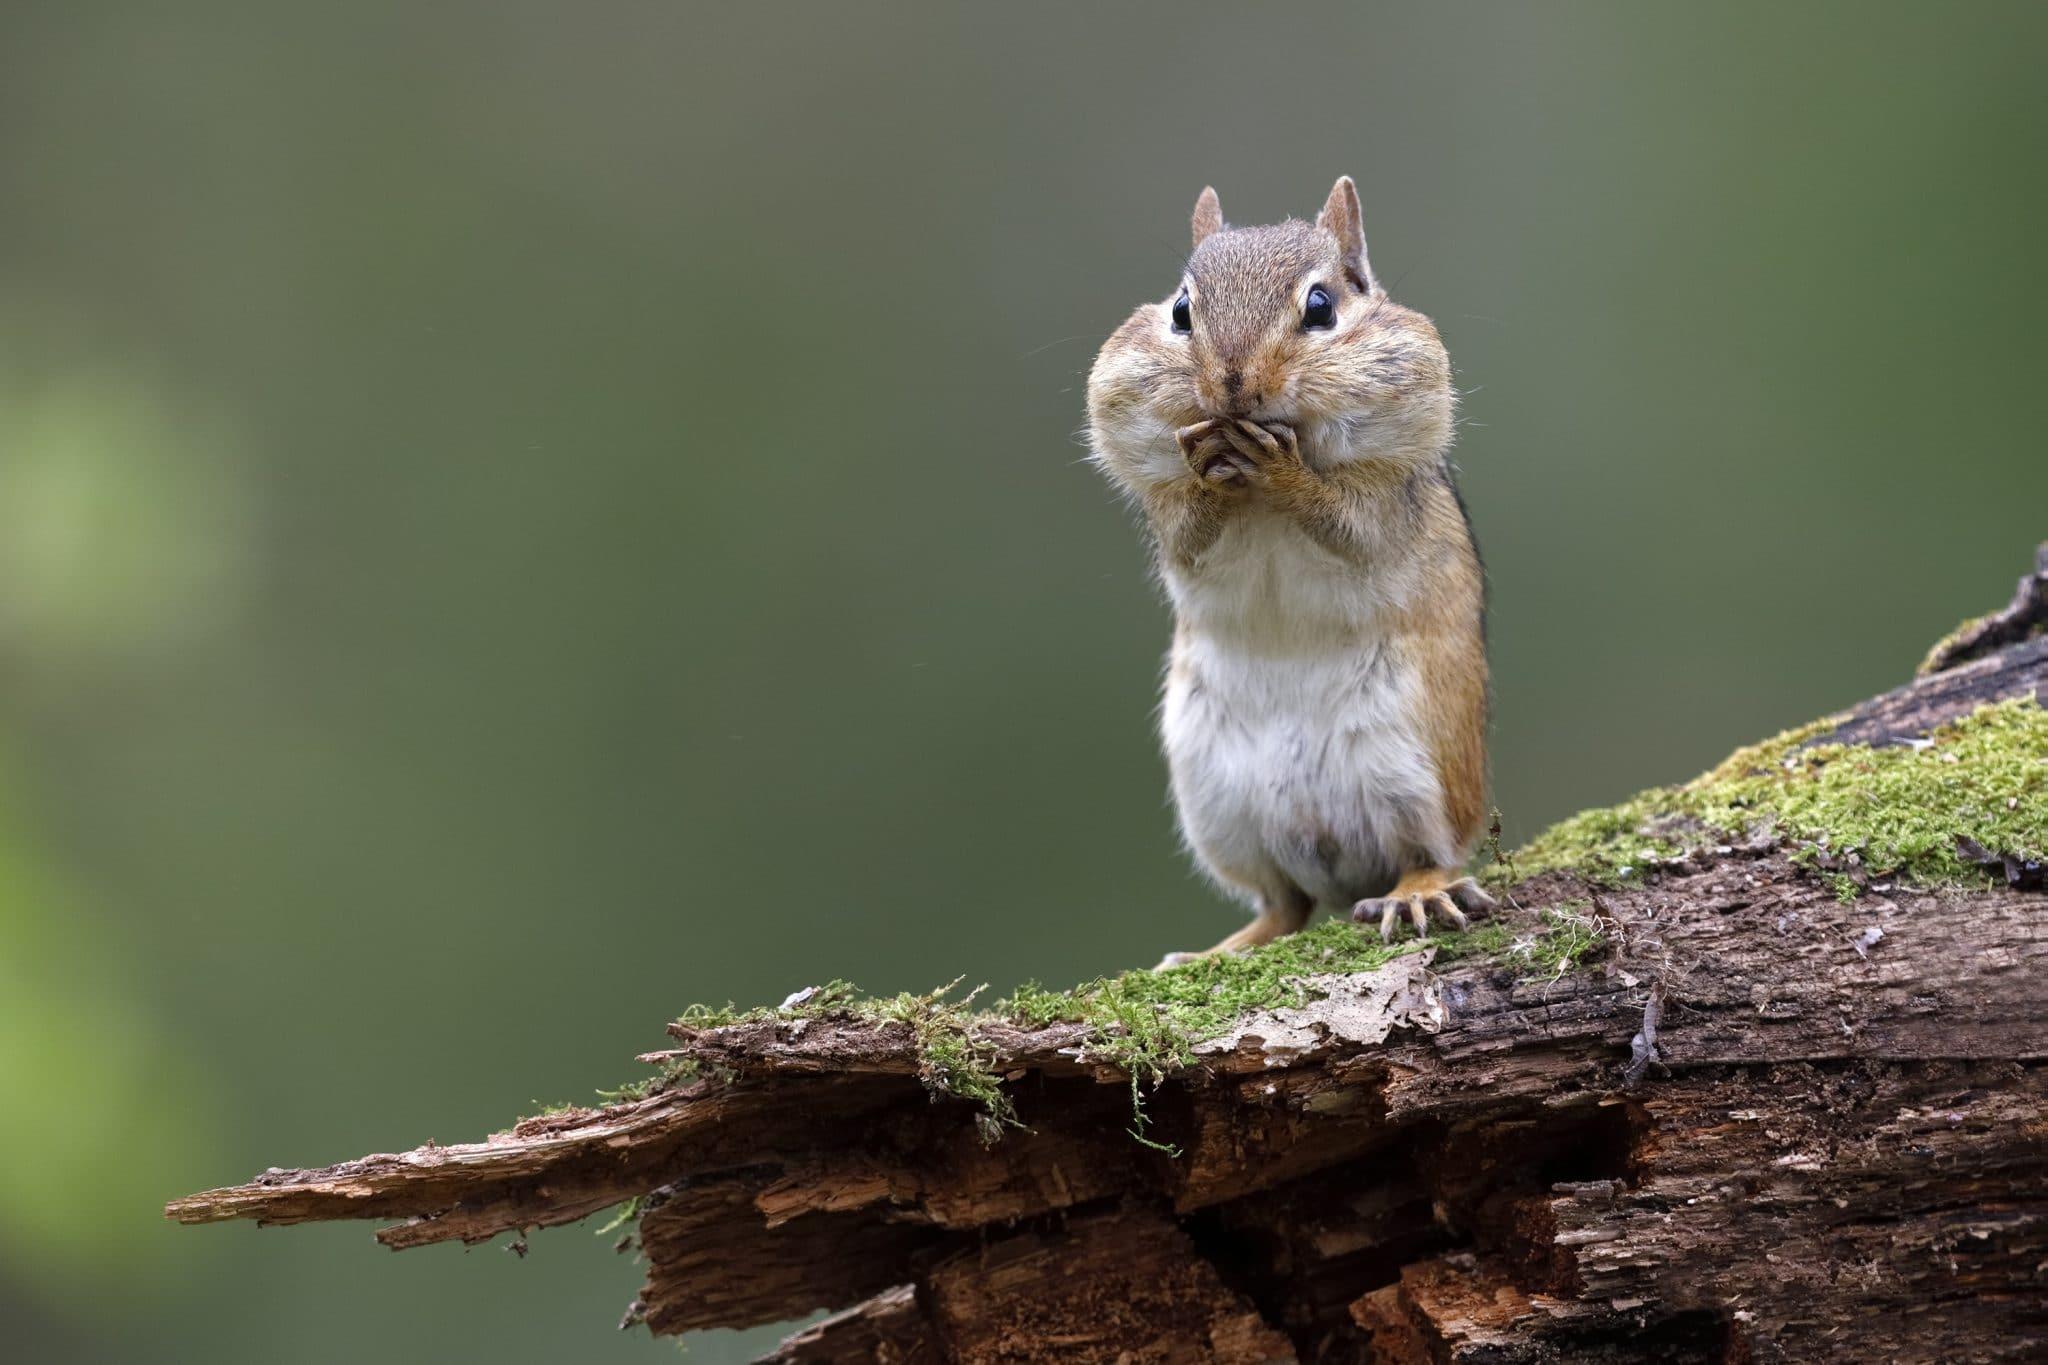 Chipmunk standing on a mossy log